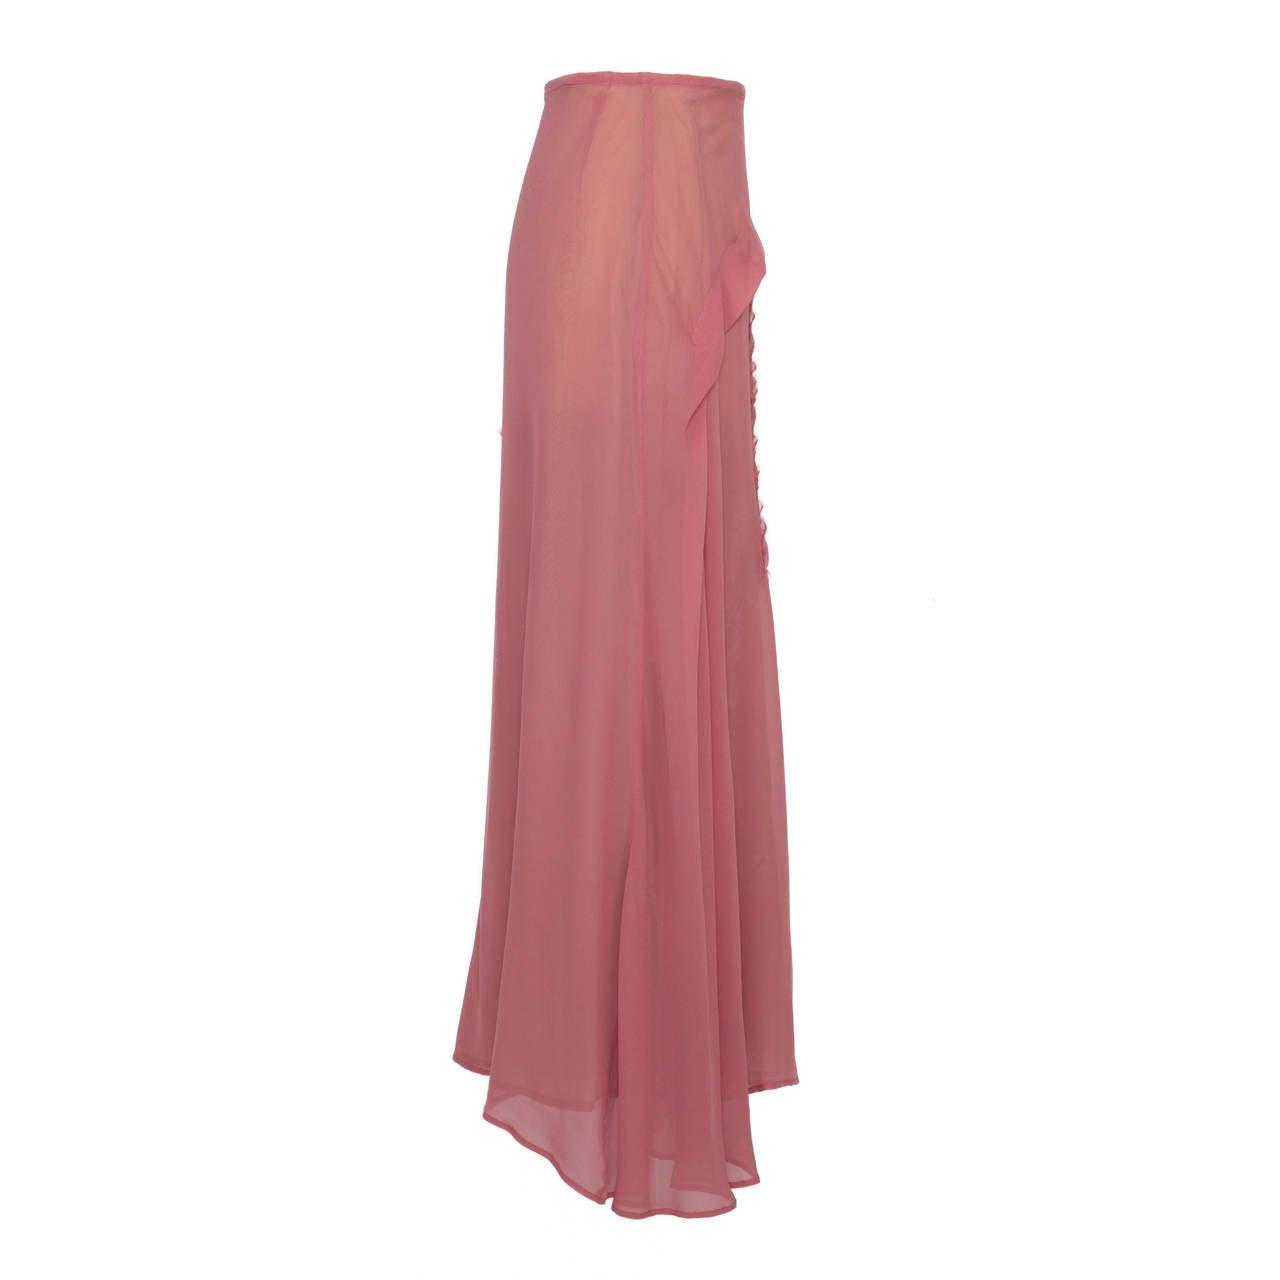 Yohji Yamamoto + Noir Pink Skirt Flower Embroidery For Sale 4